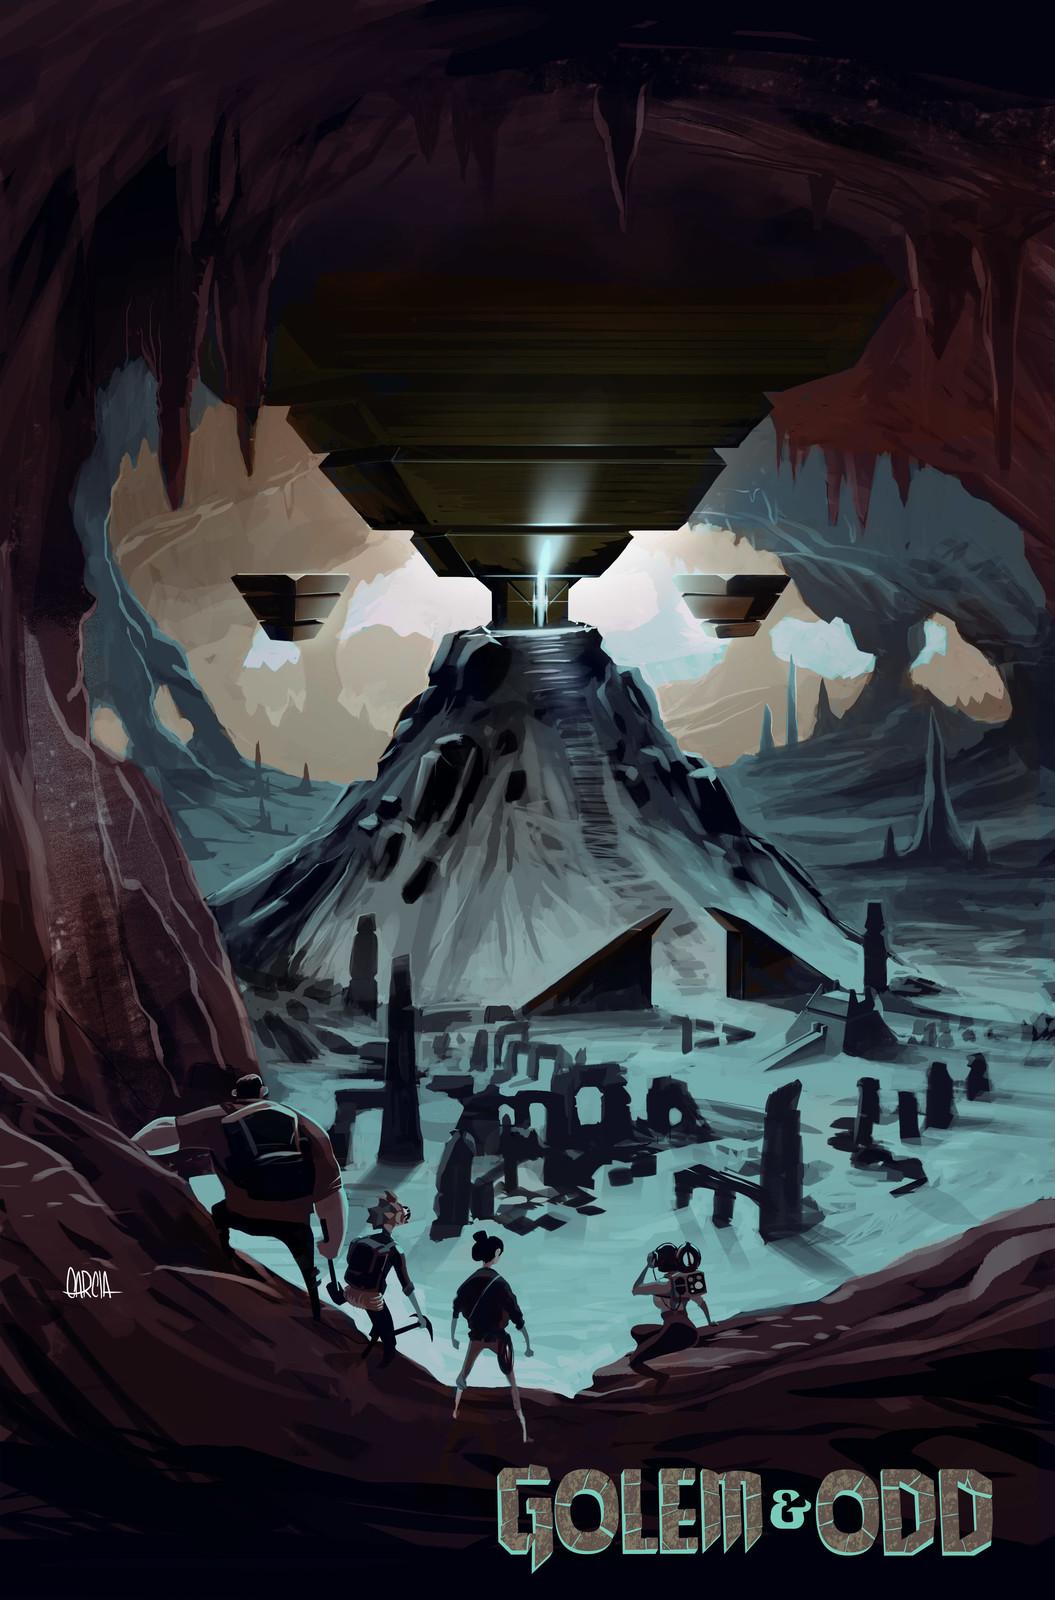 Golem & Odd environment concept